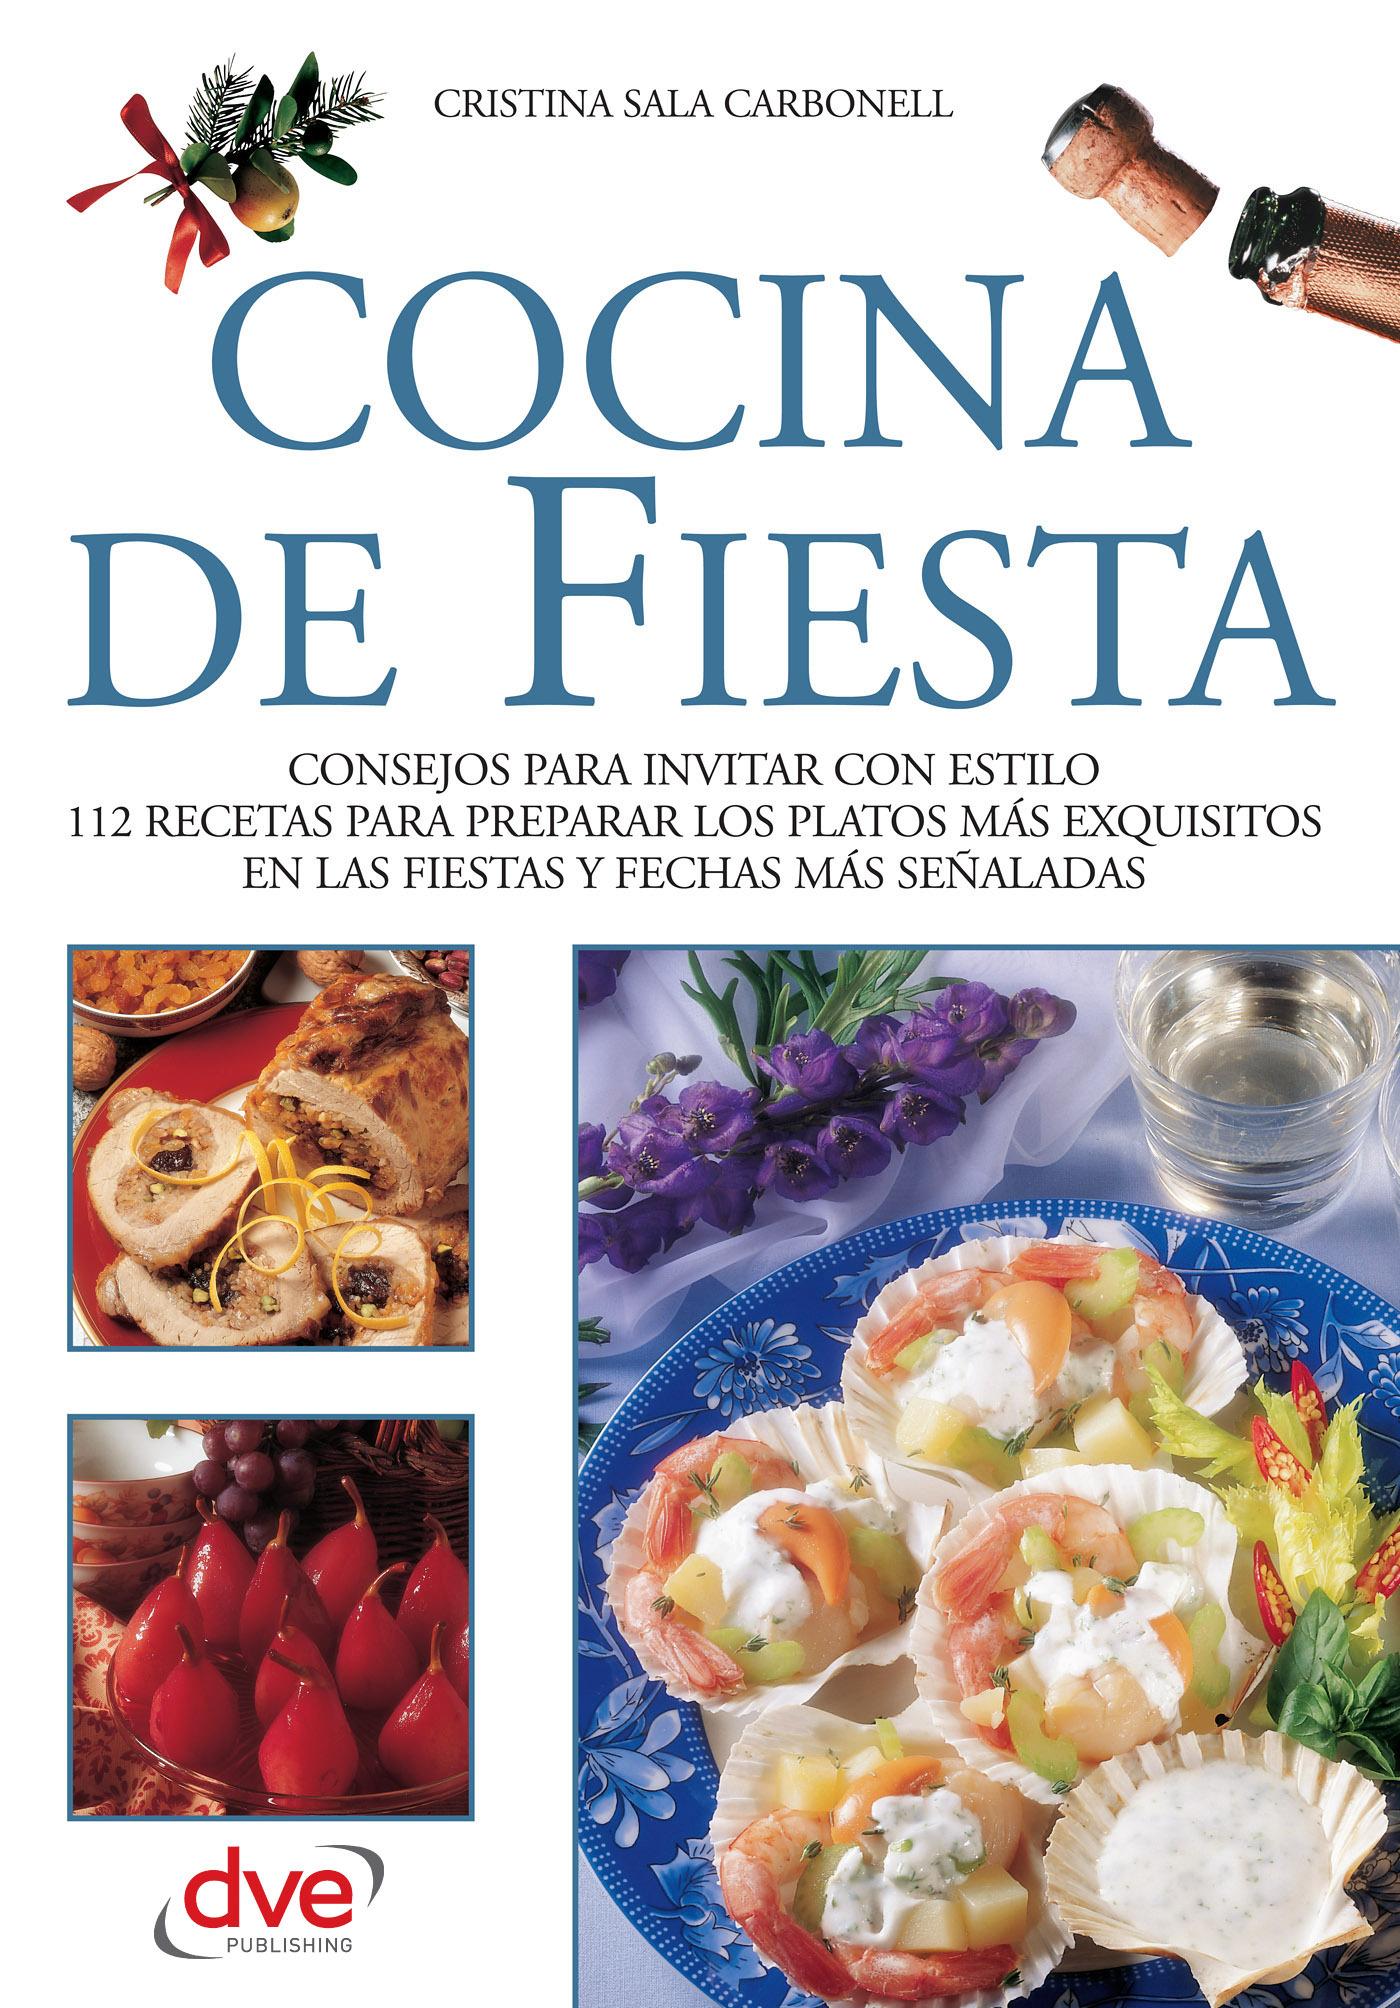 Carbonell, Cristina Sala - Cocina de fiesta, ebook